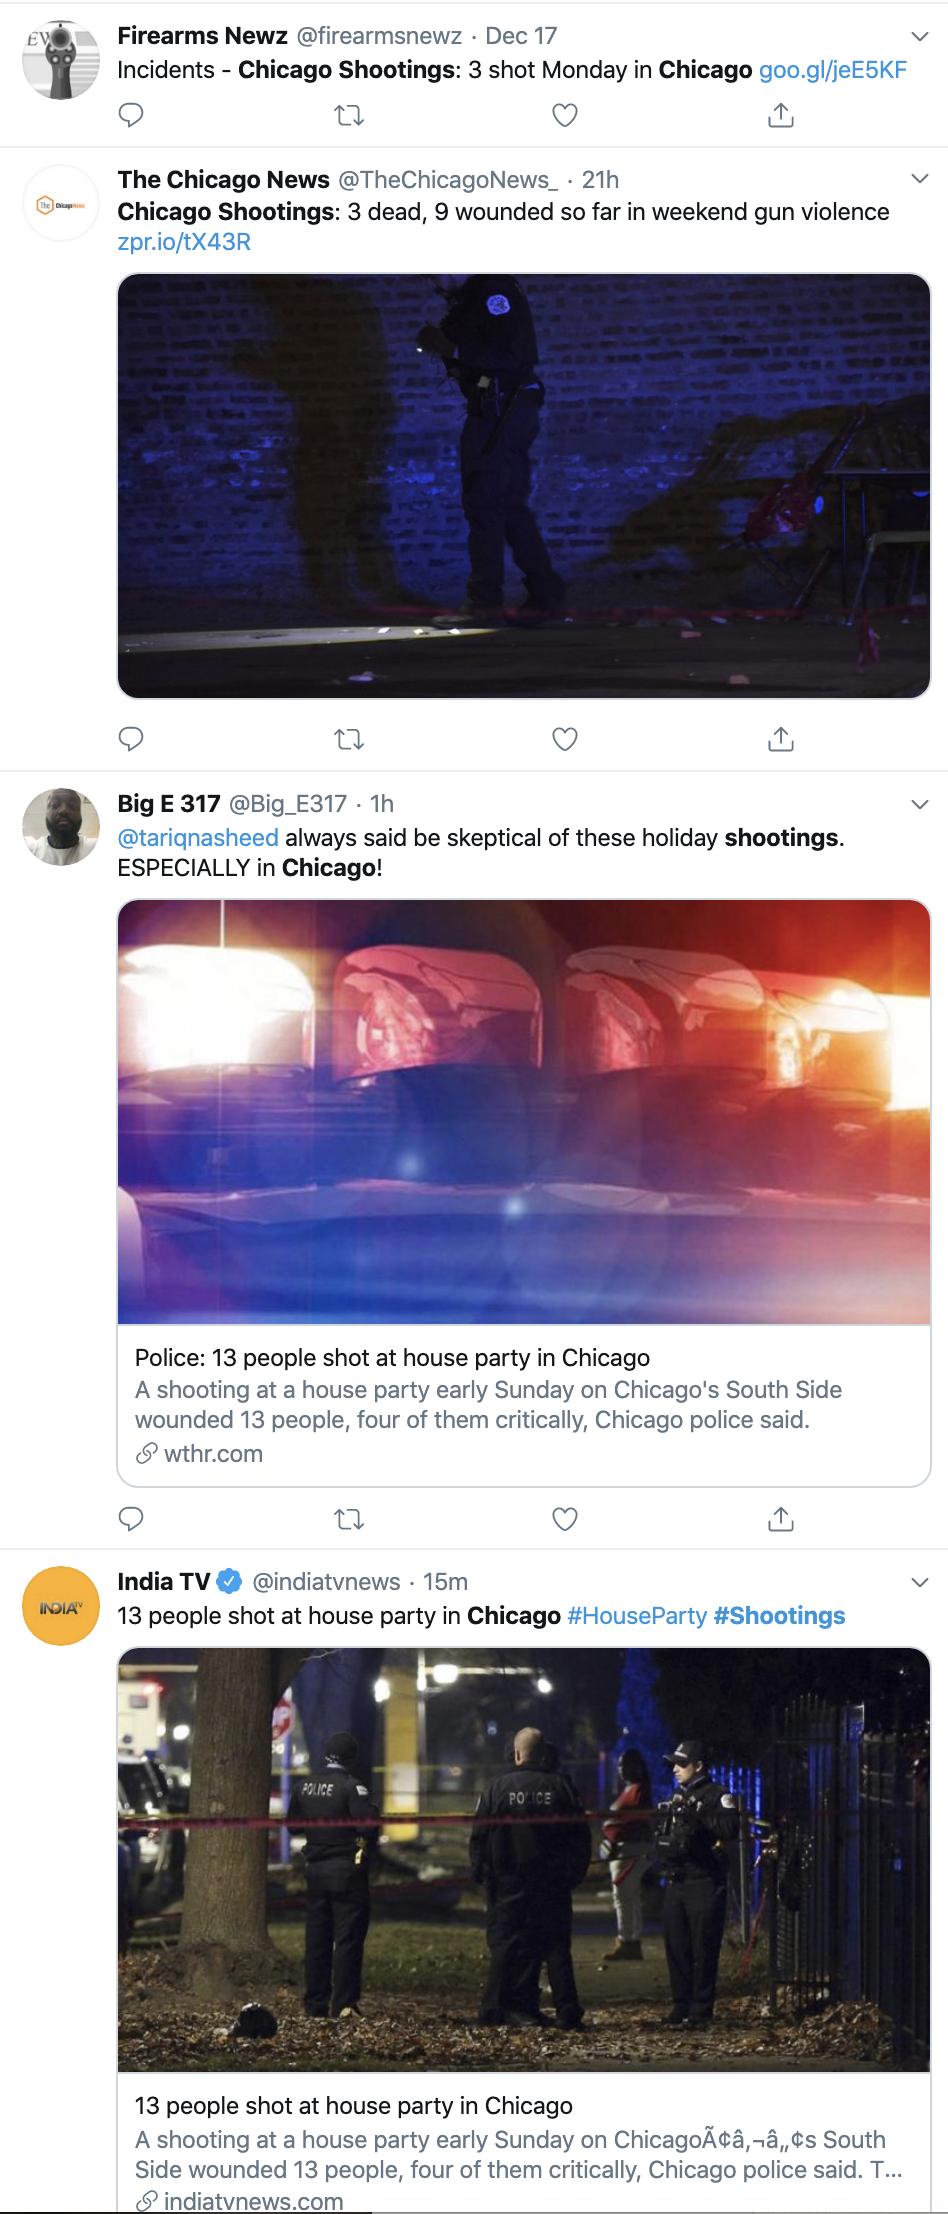 Screen-Shot-2019-12-22-at-8.59.29-AM Sunday Morning Mass Shooting Hits 13 People Black Lives Matter Featured Gun Control Mass Shootings Racism Top Stories